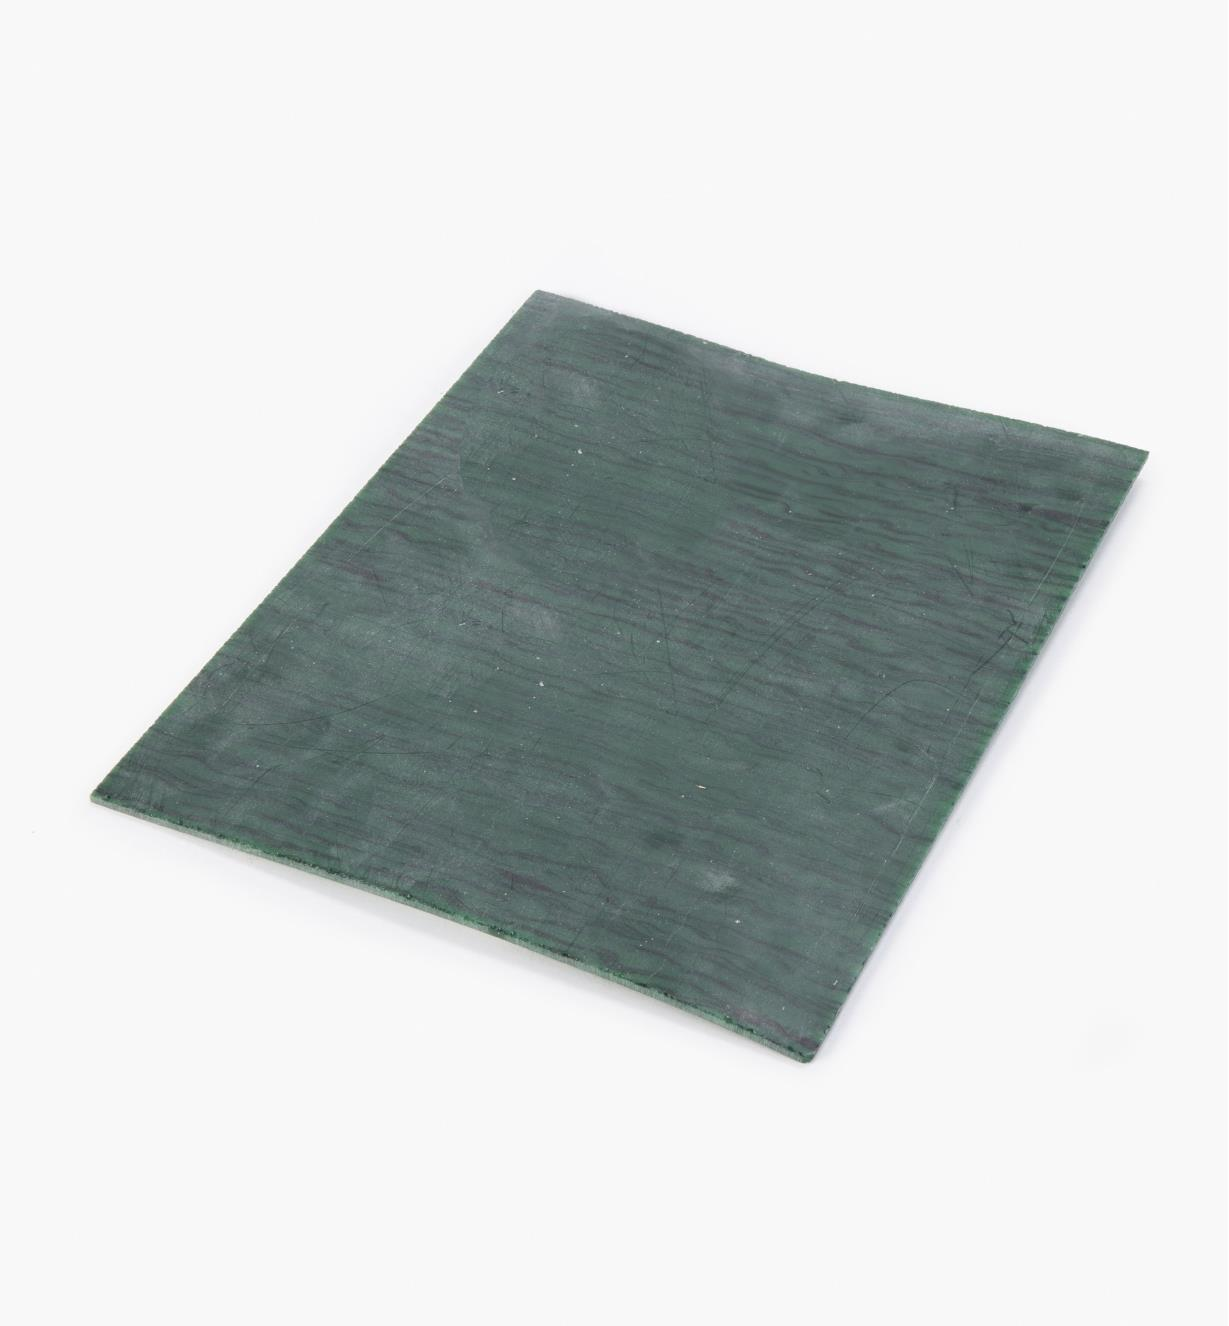 87K2108 - Plaque imitation malachite, 23 cm x 28 cm x 3 mm